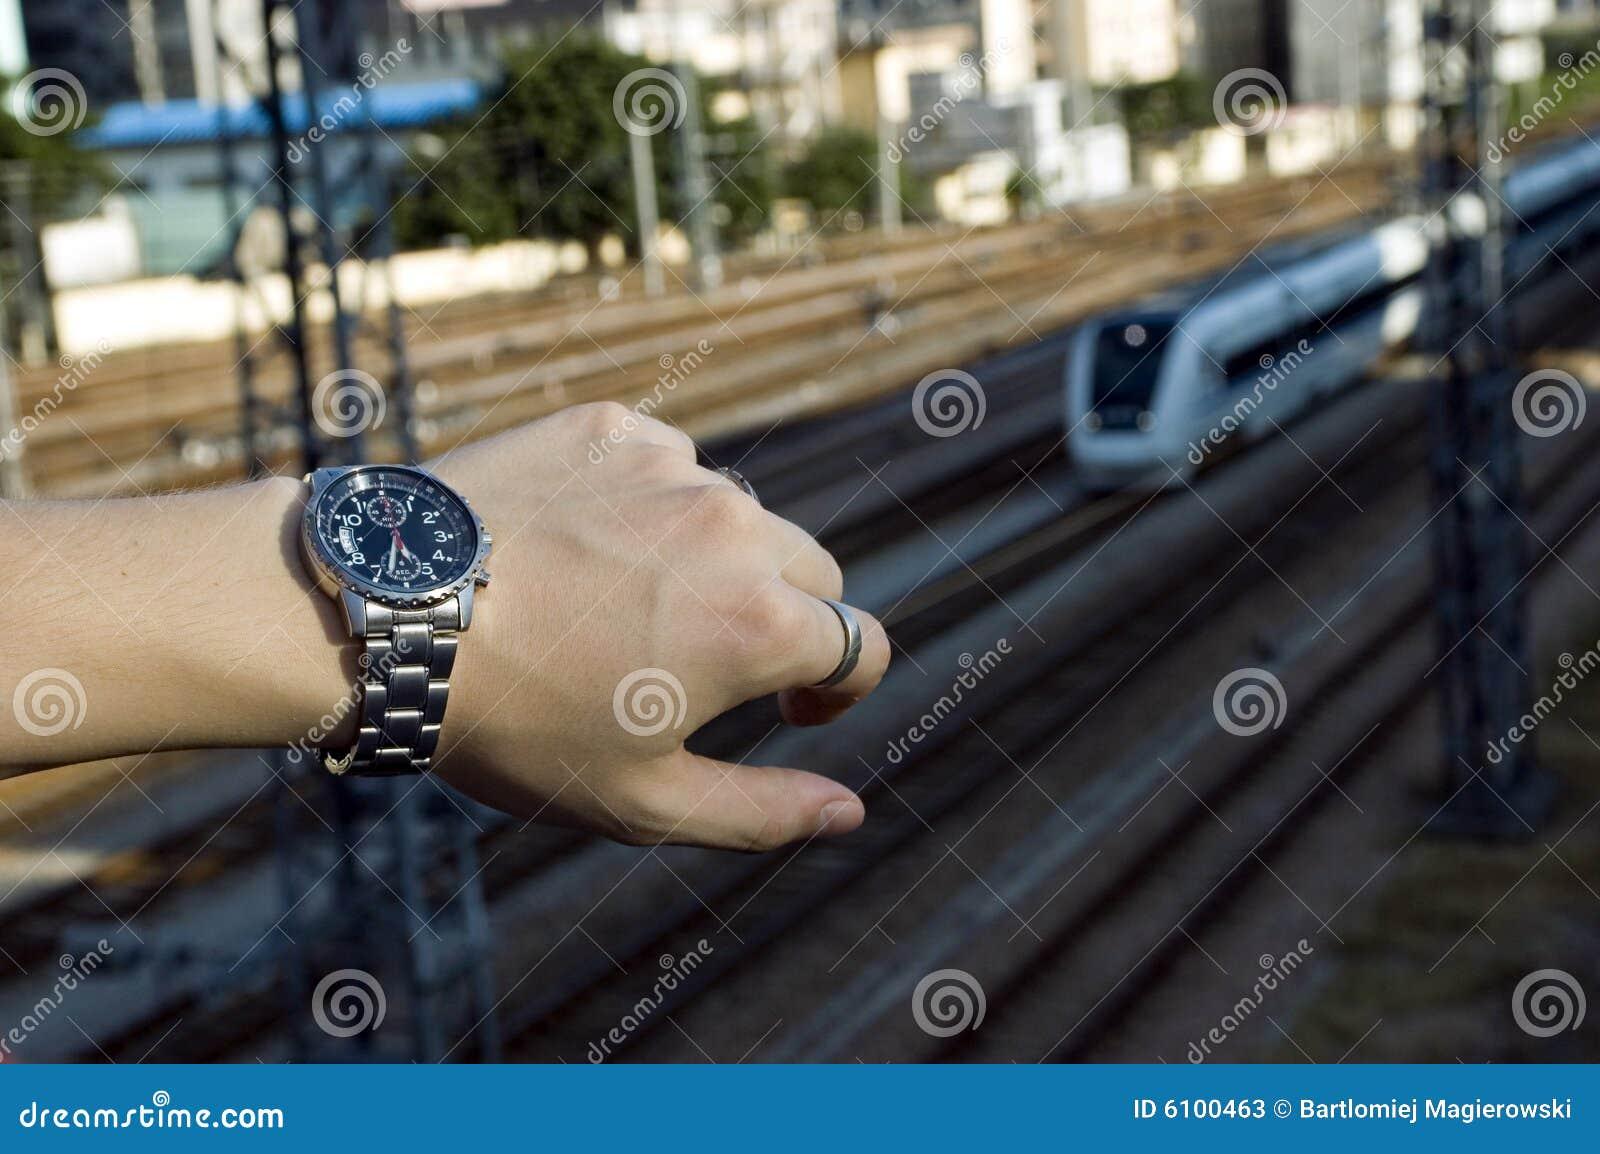 Patrz na pociąg